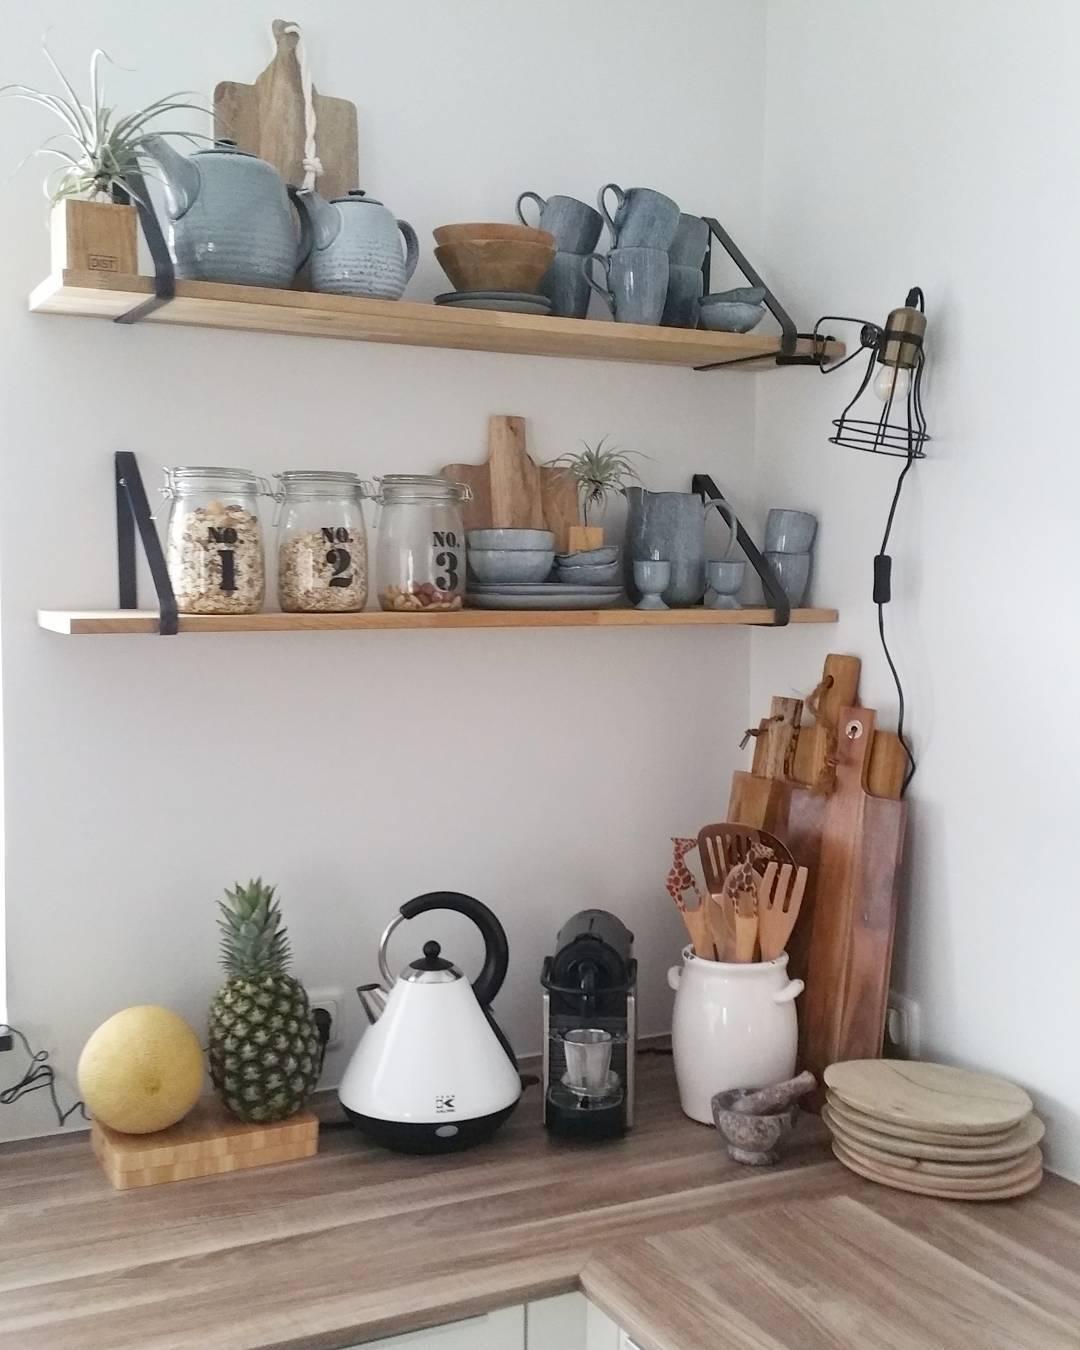 rak gantung minimalis rak dapur minimalis bumbu dapur